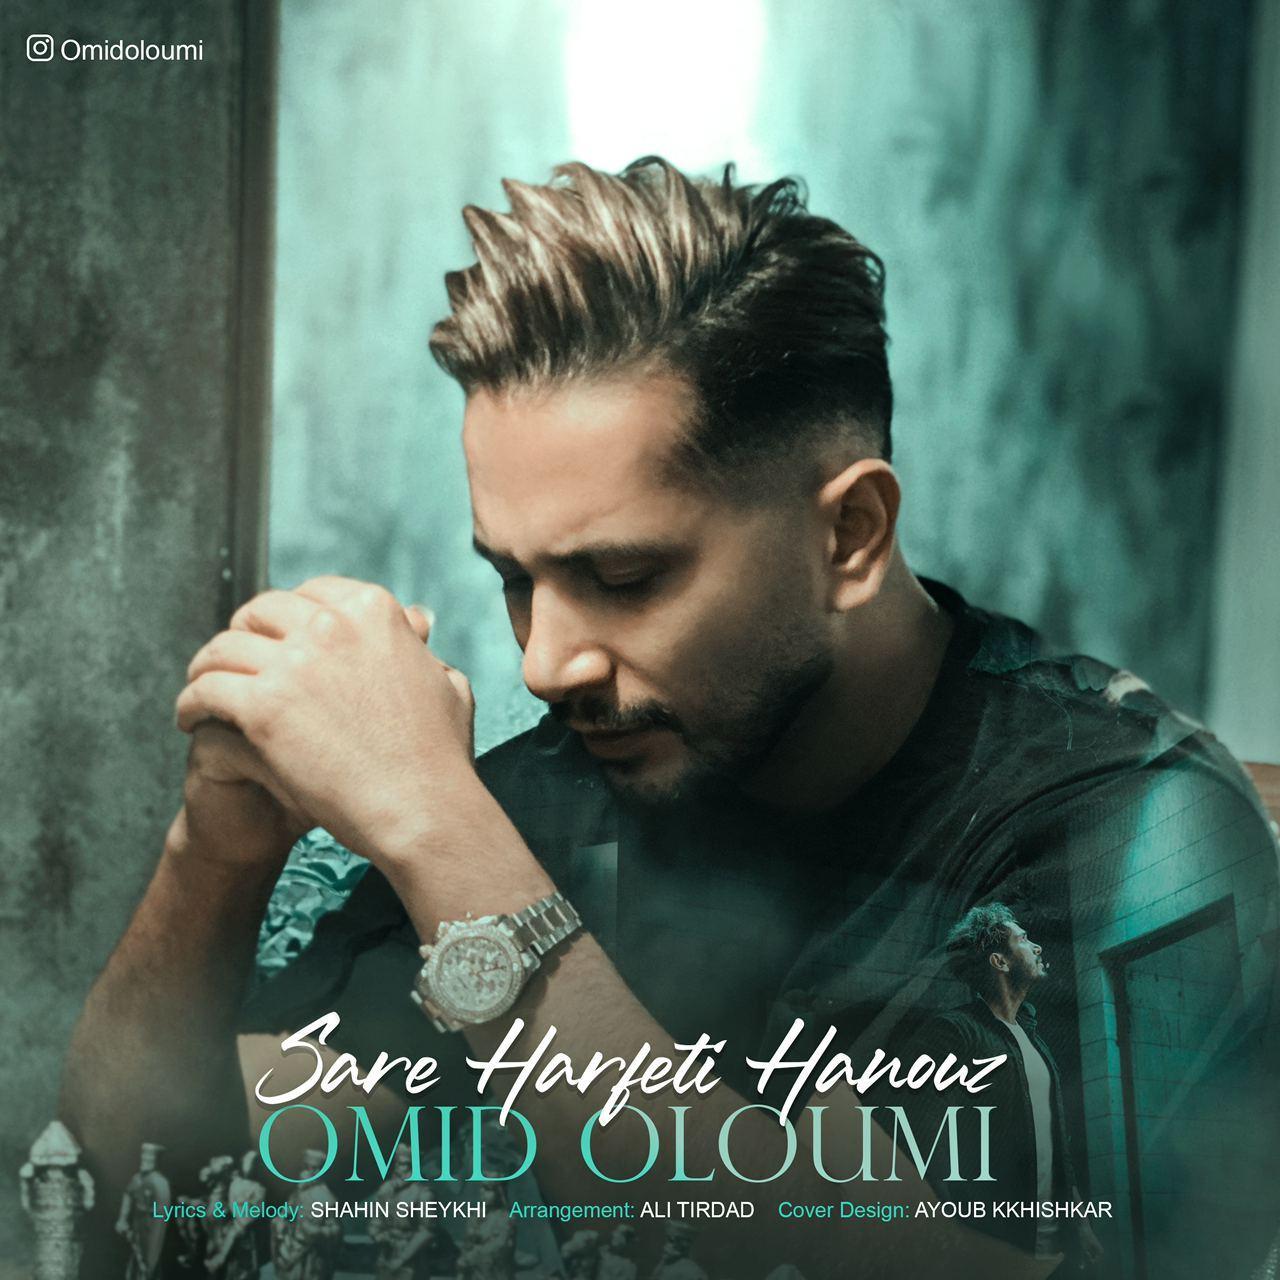 Omid Oloumi – Sare Harfeti Hanouz